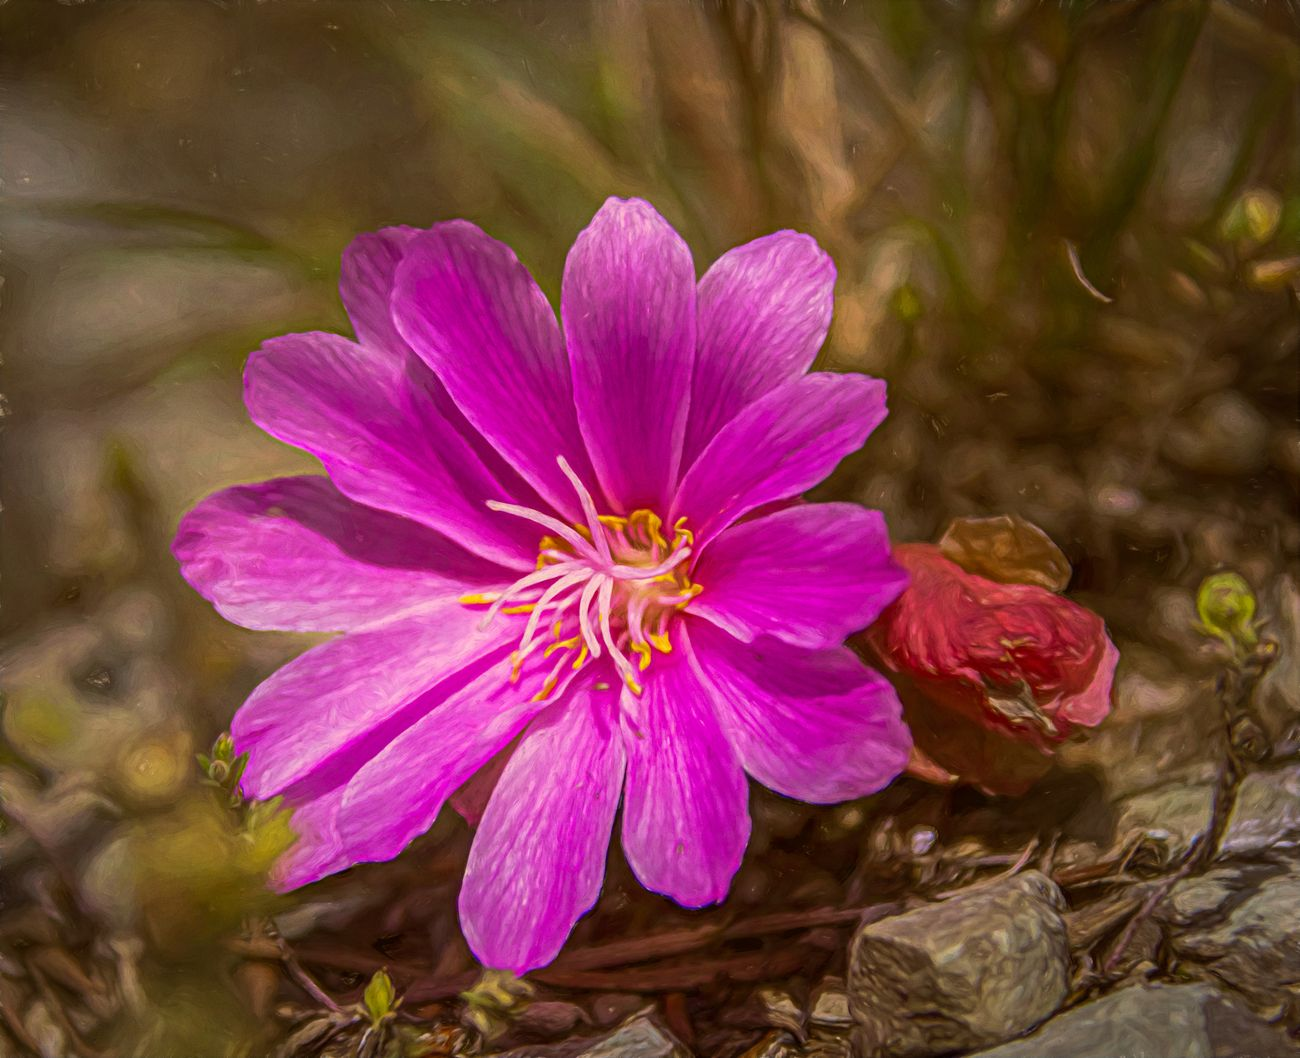 Montana's state flower